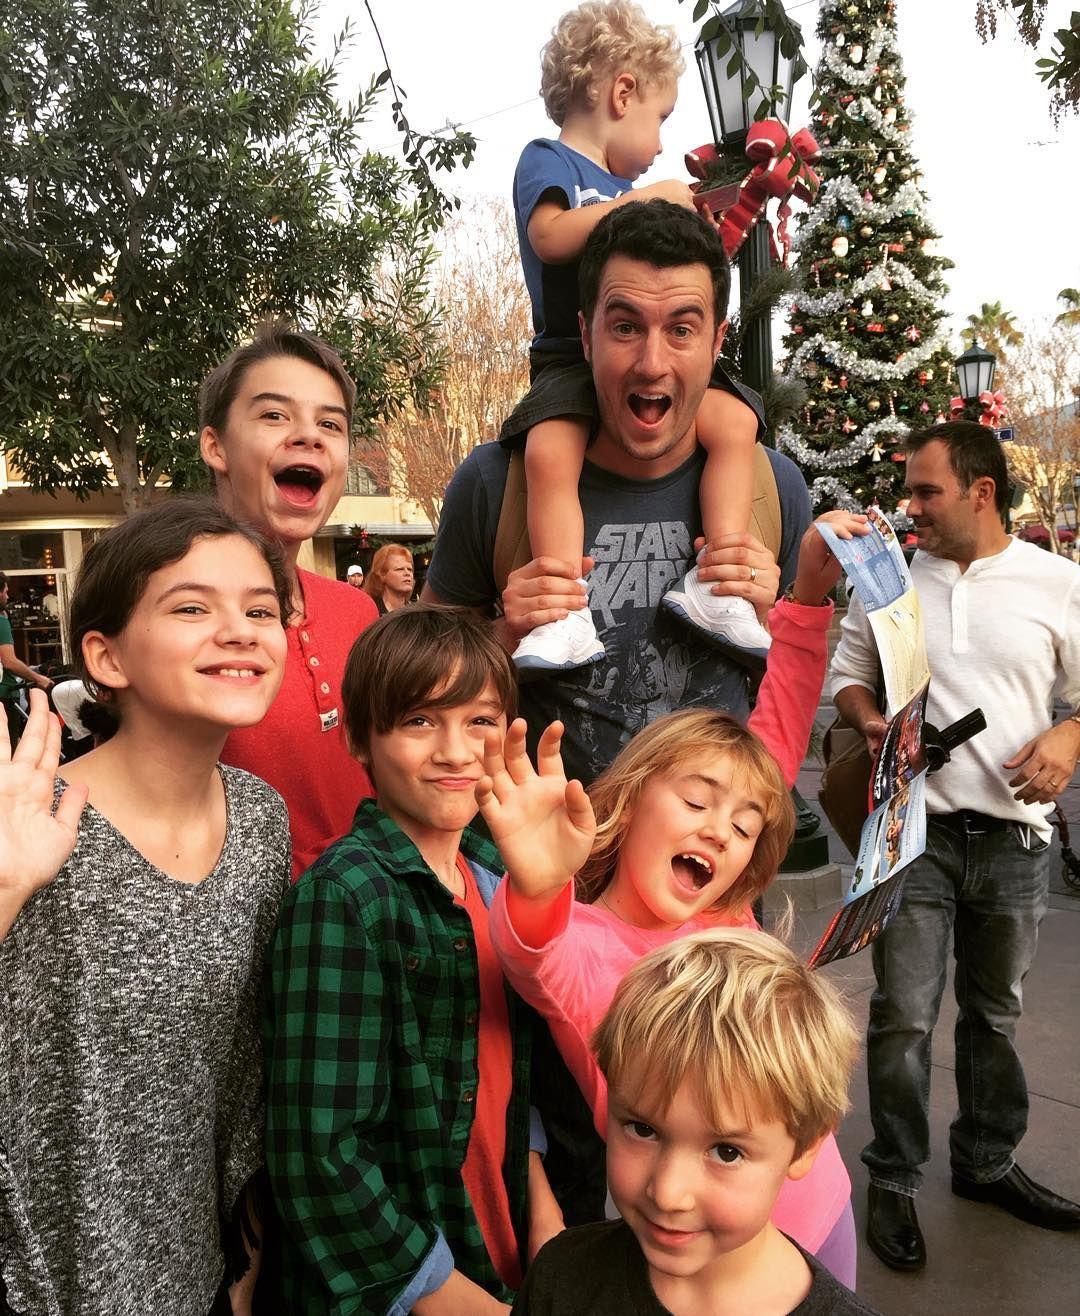 Having A Blast Hanging With Officialkittiesmamayt In Disneyland